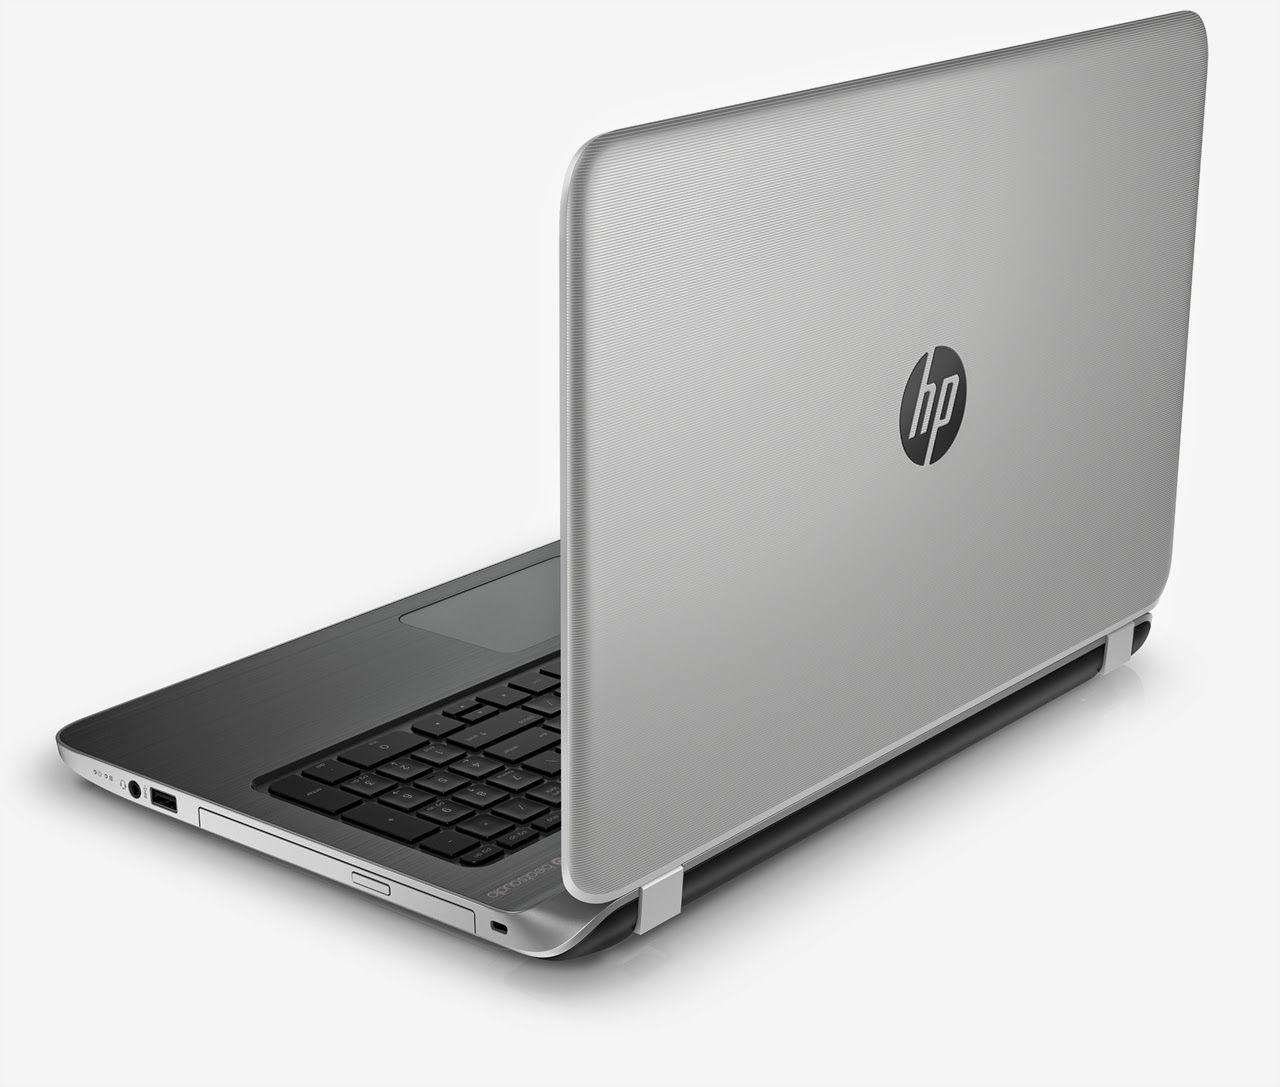 Lotus Computer Lenovo I3 Laptop With Headphone Laptop Cheap Laptop Deals Laptop